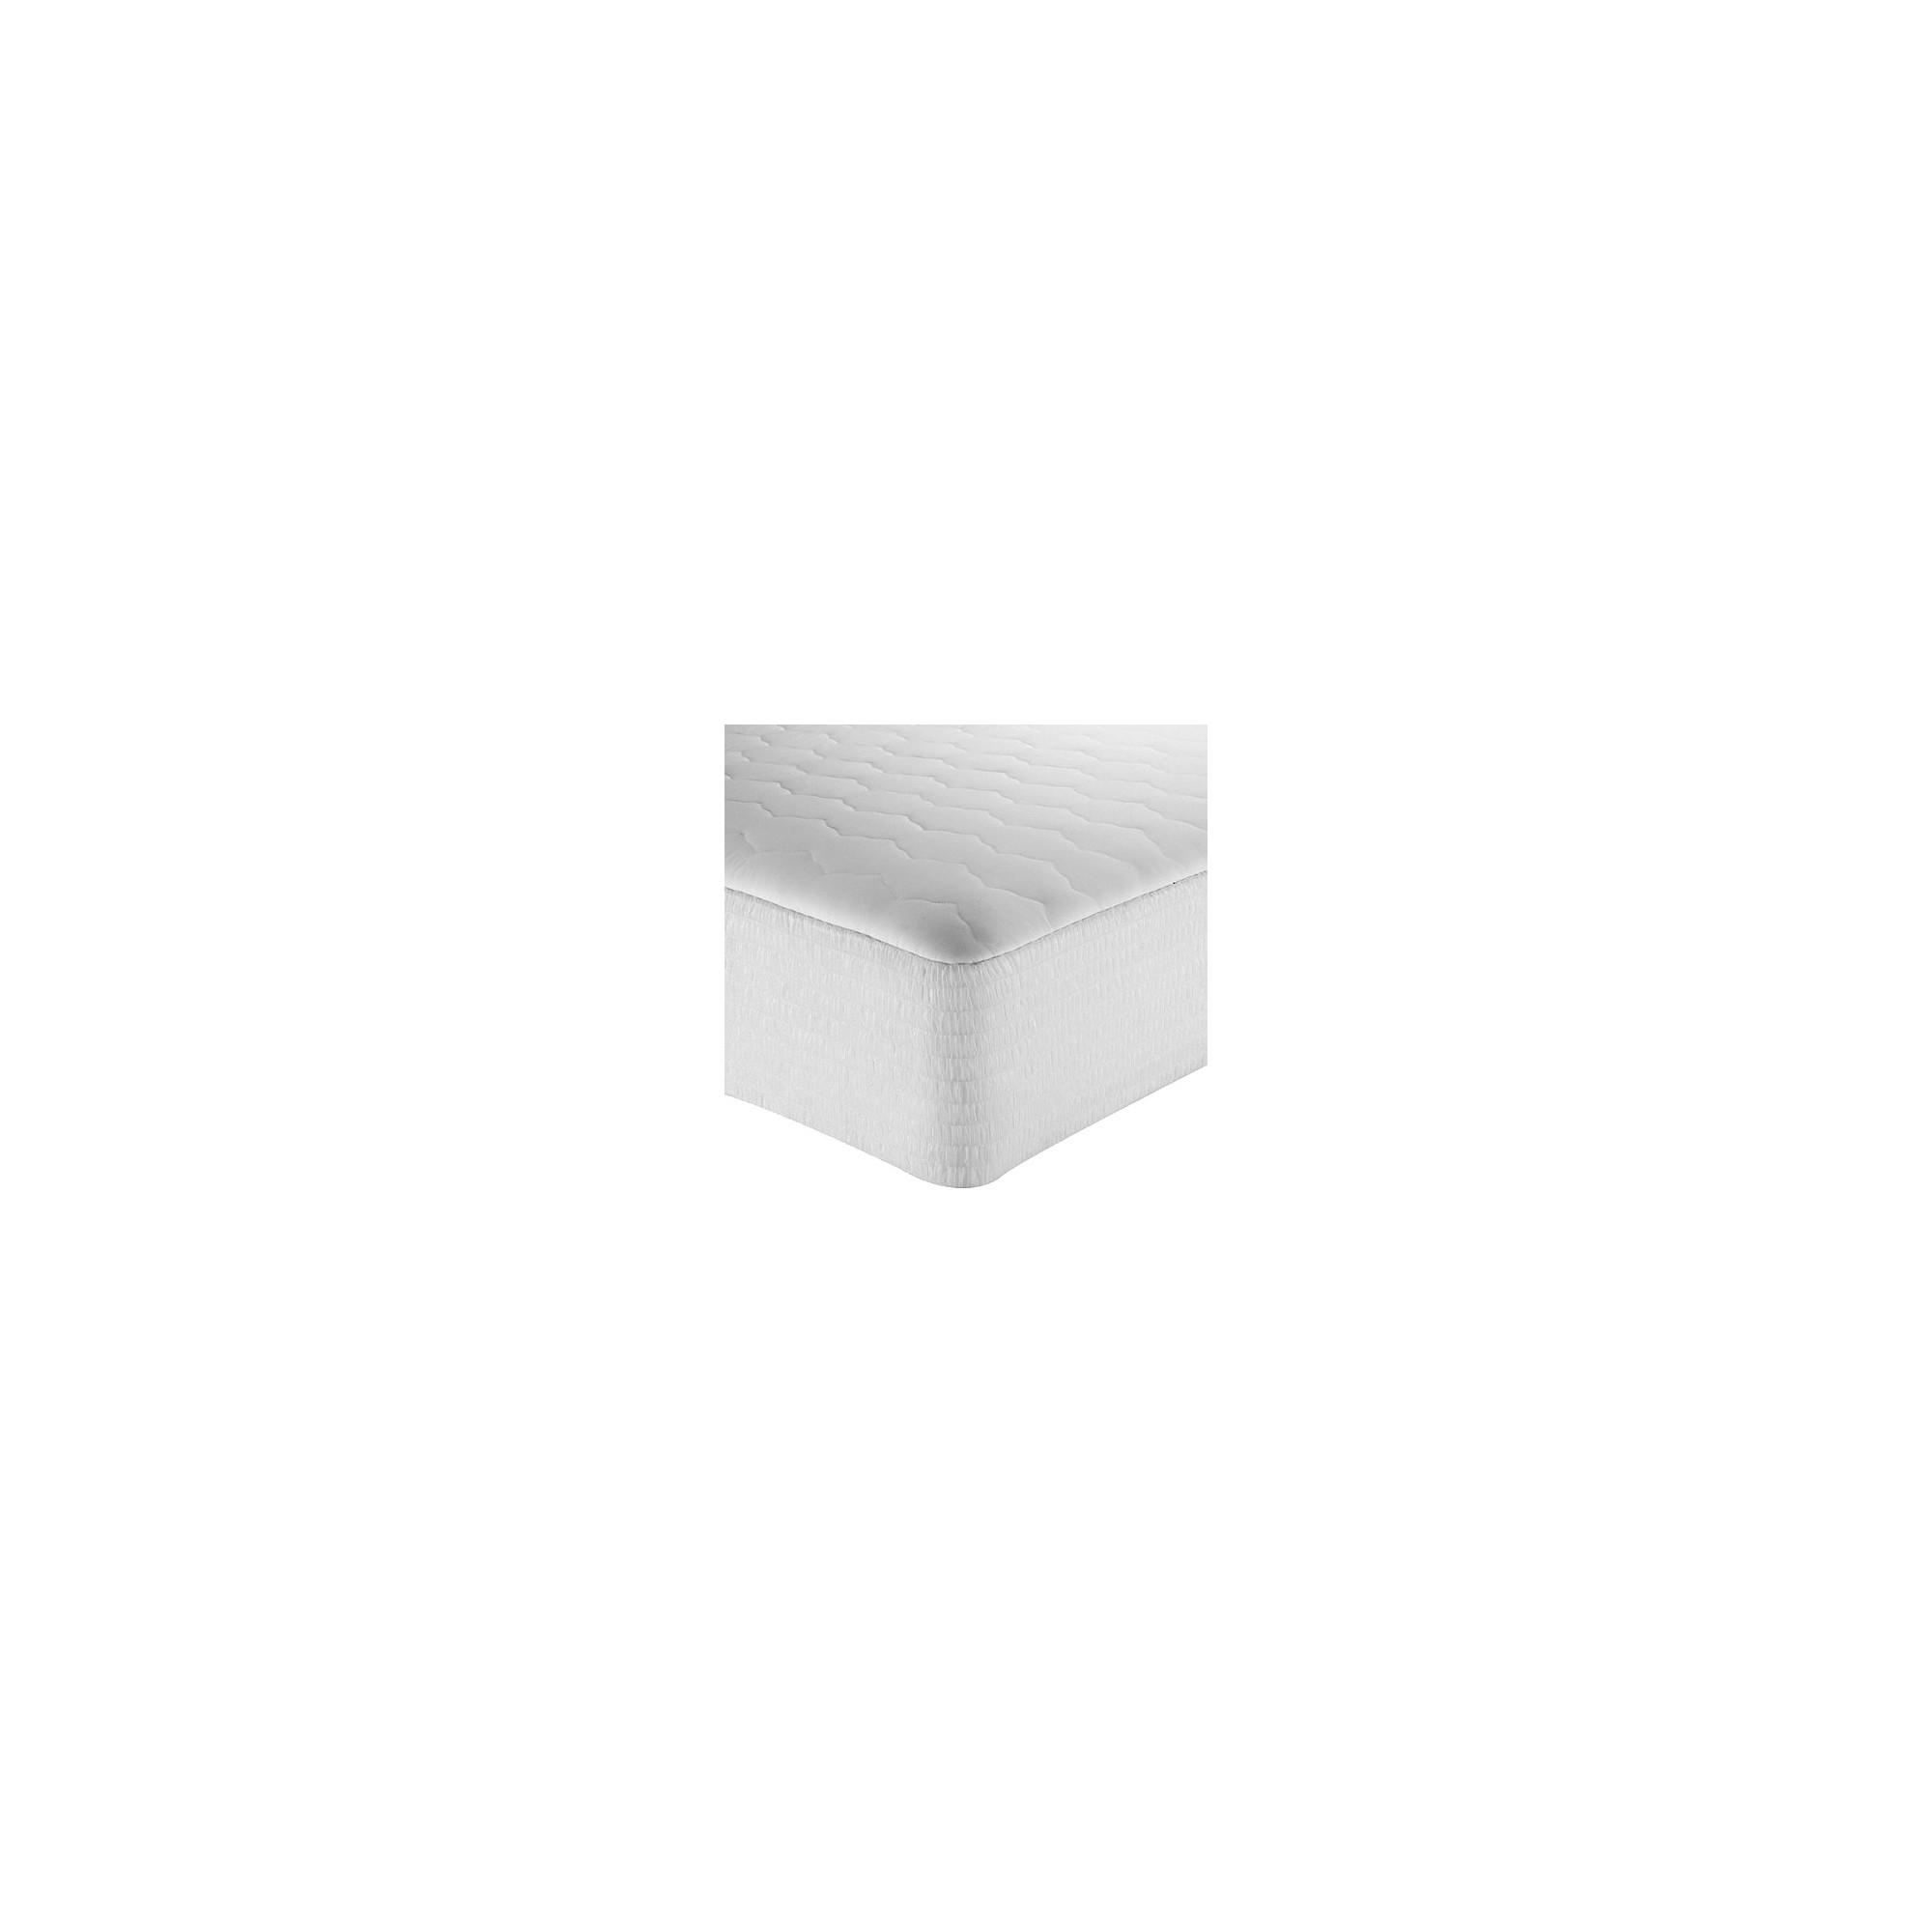 Twin-Size 200 Thread Count Cotton Mattress Pad, White